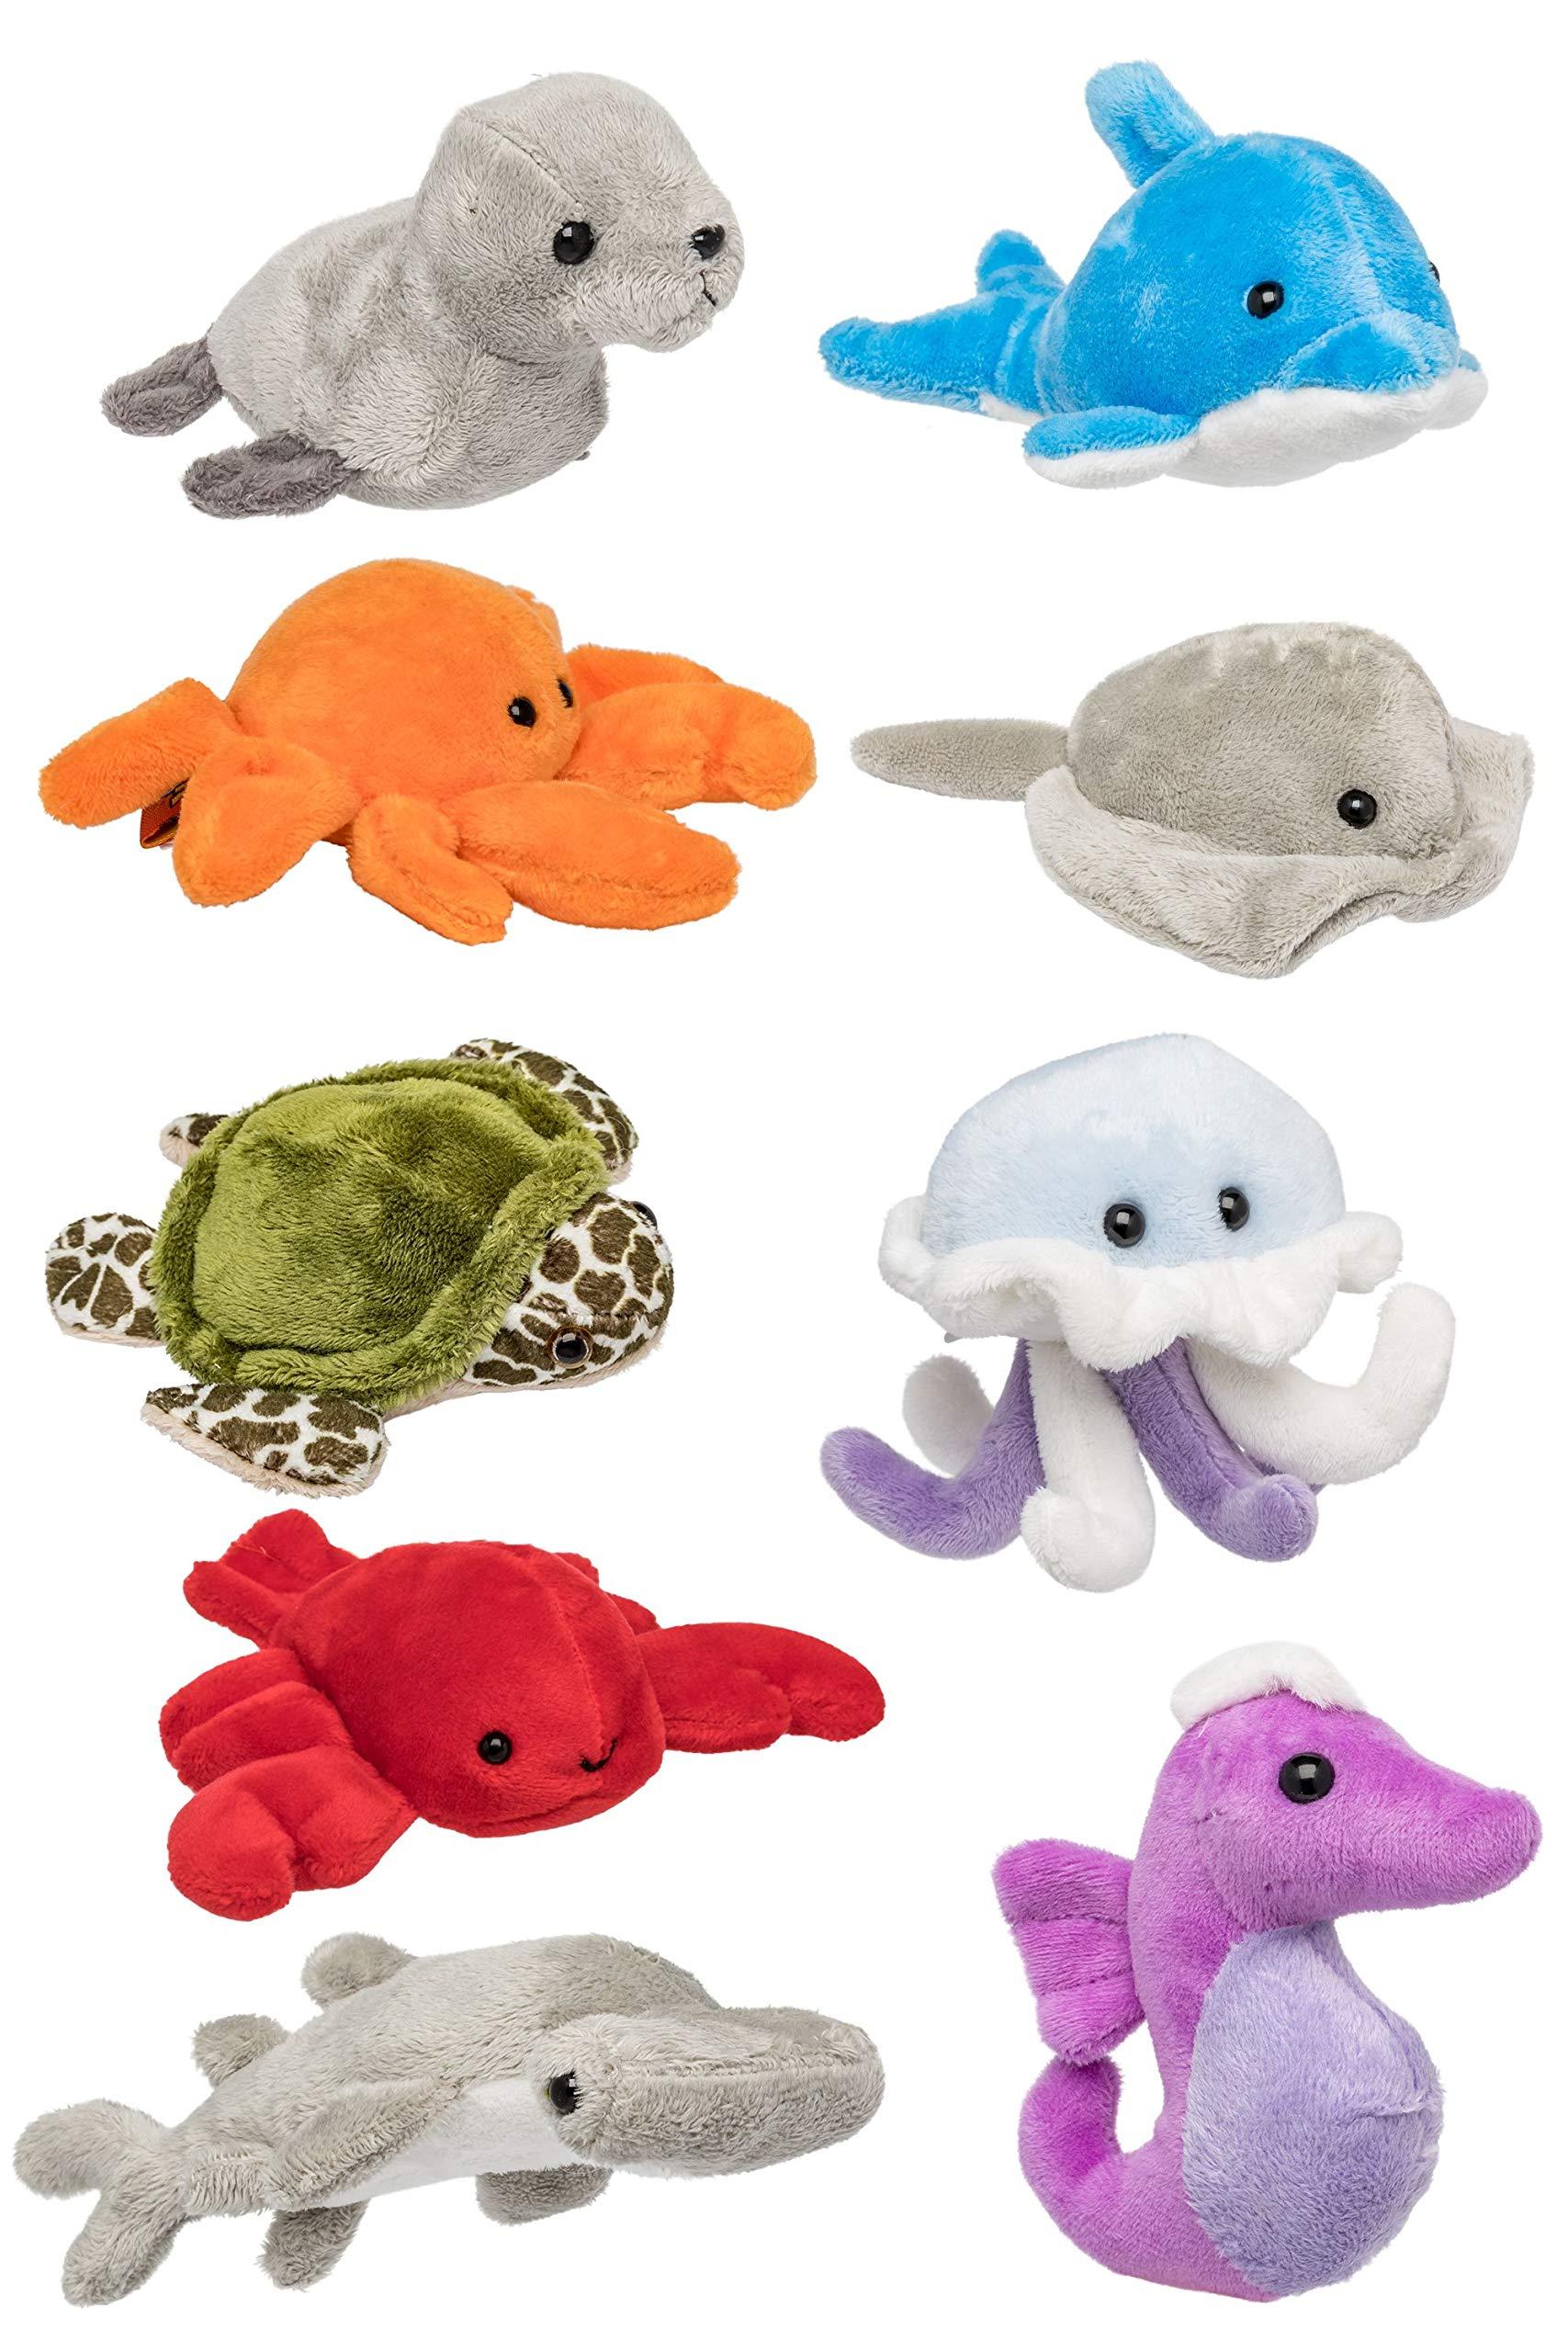 Wildlife Tree (9 Pack) Ocean Mini 4 Inch Stuffed Animals, Ocean Animal Toys by Wildlife Tree